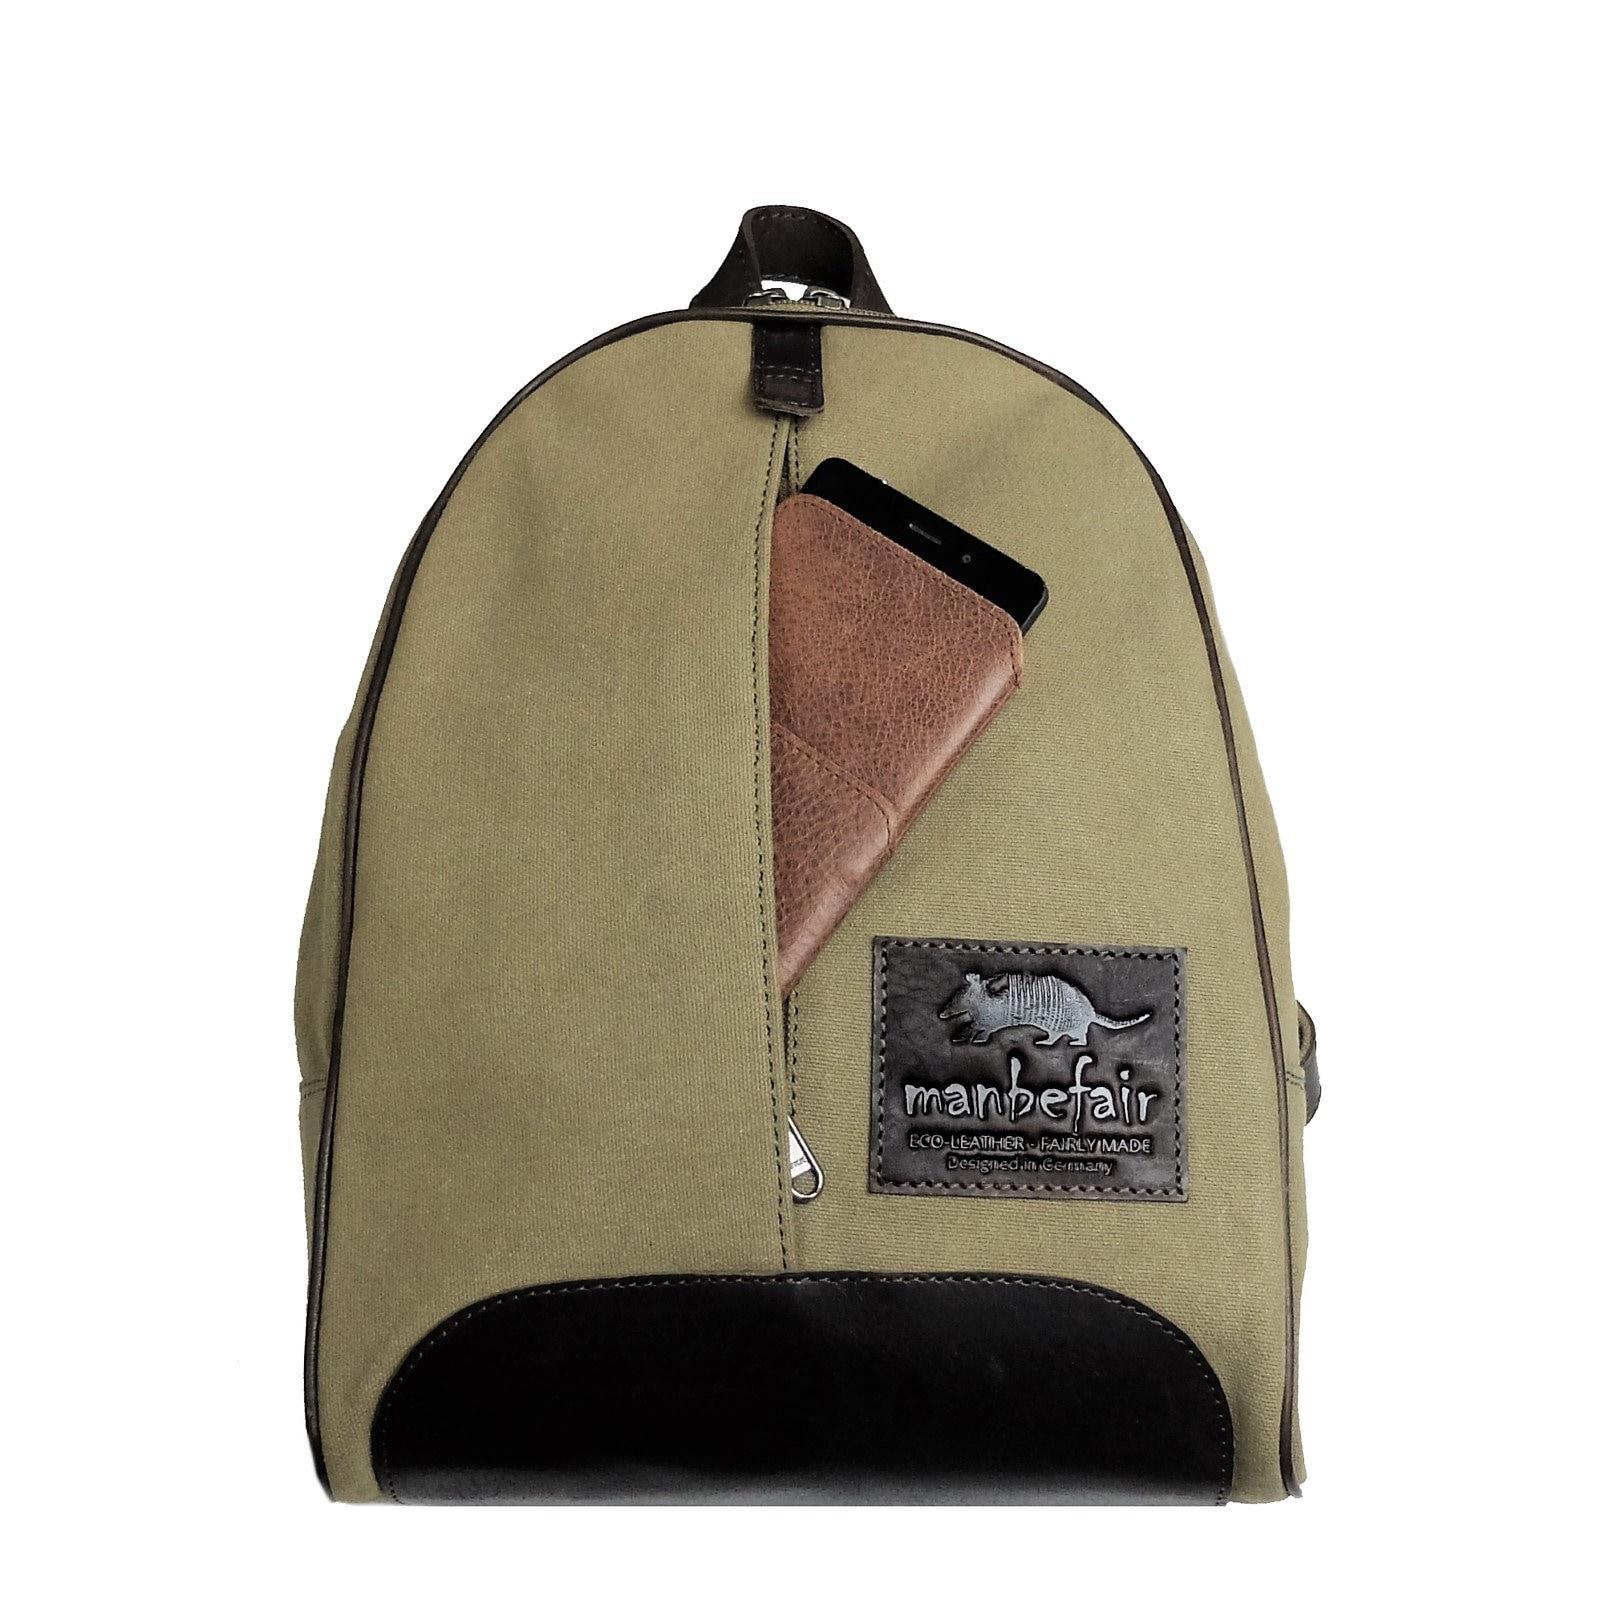 8350251d3465f Manbefair Fair Trade backpack Girona olive